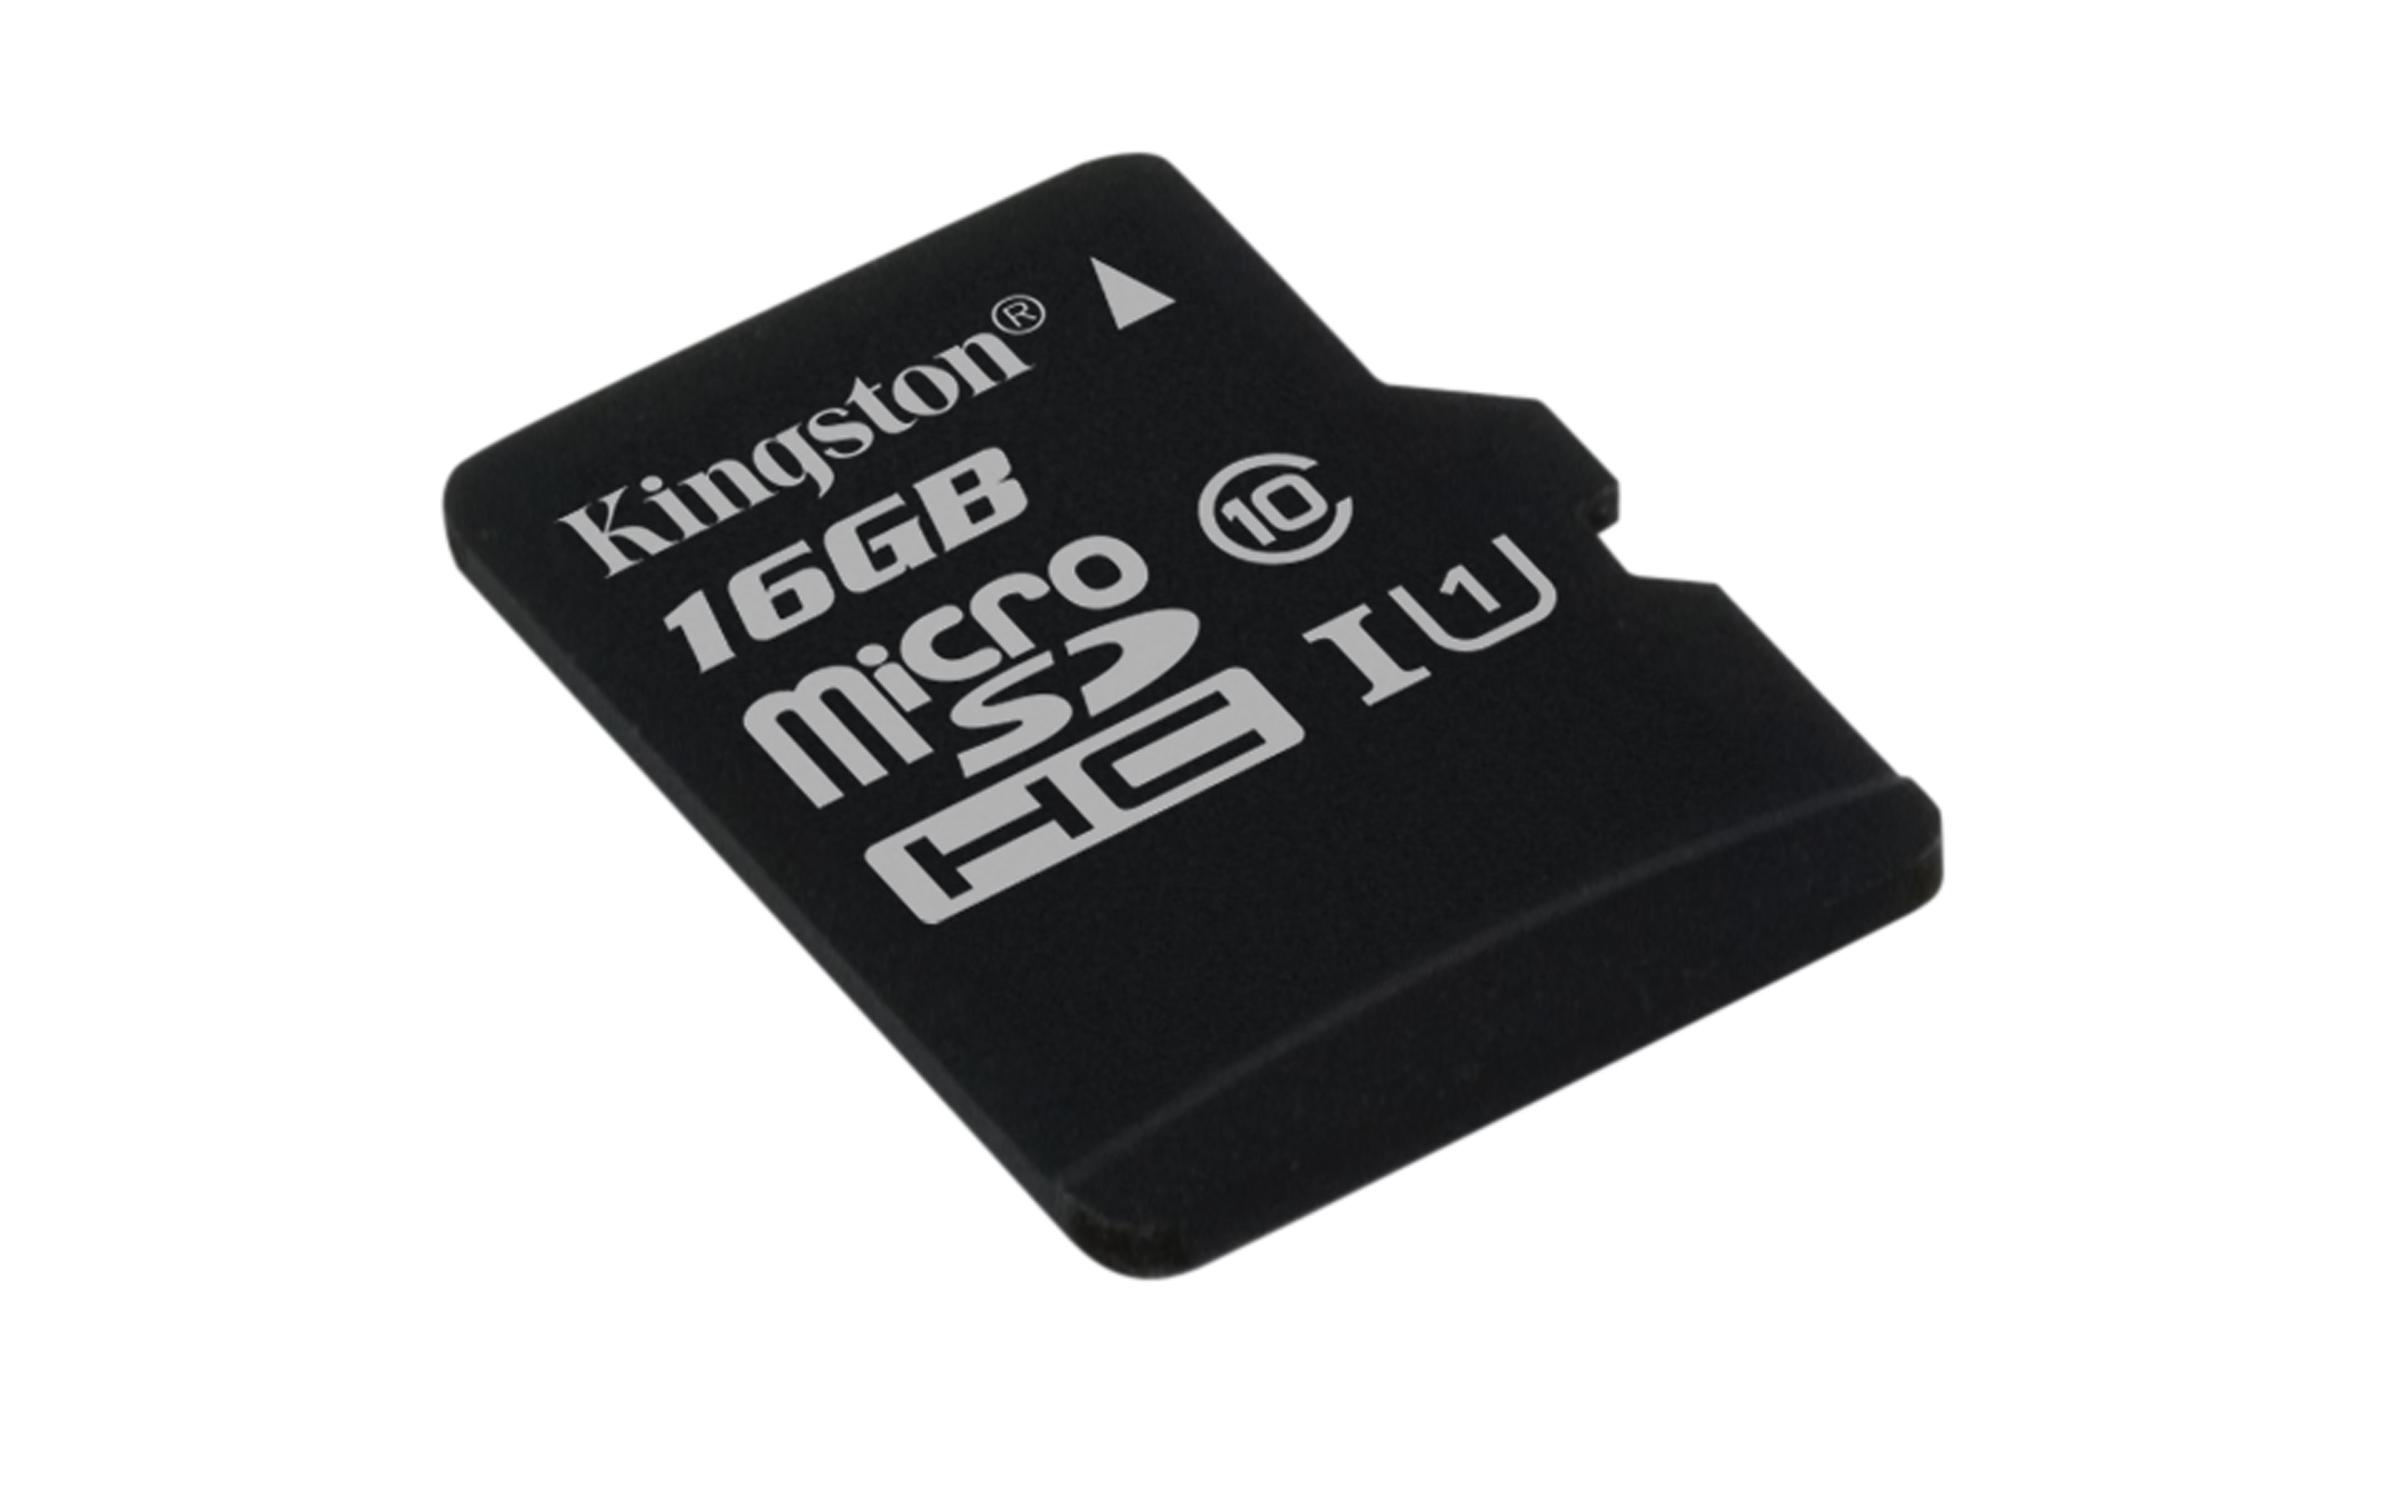 Kingston Technology microSDHC Class 10 UHS-I Card 16GB 16GB MicroSDHC UHS-I Class 10 memory card